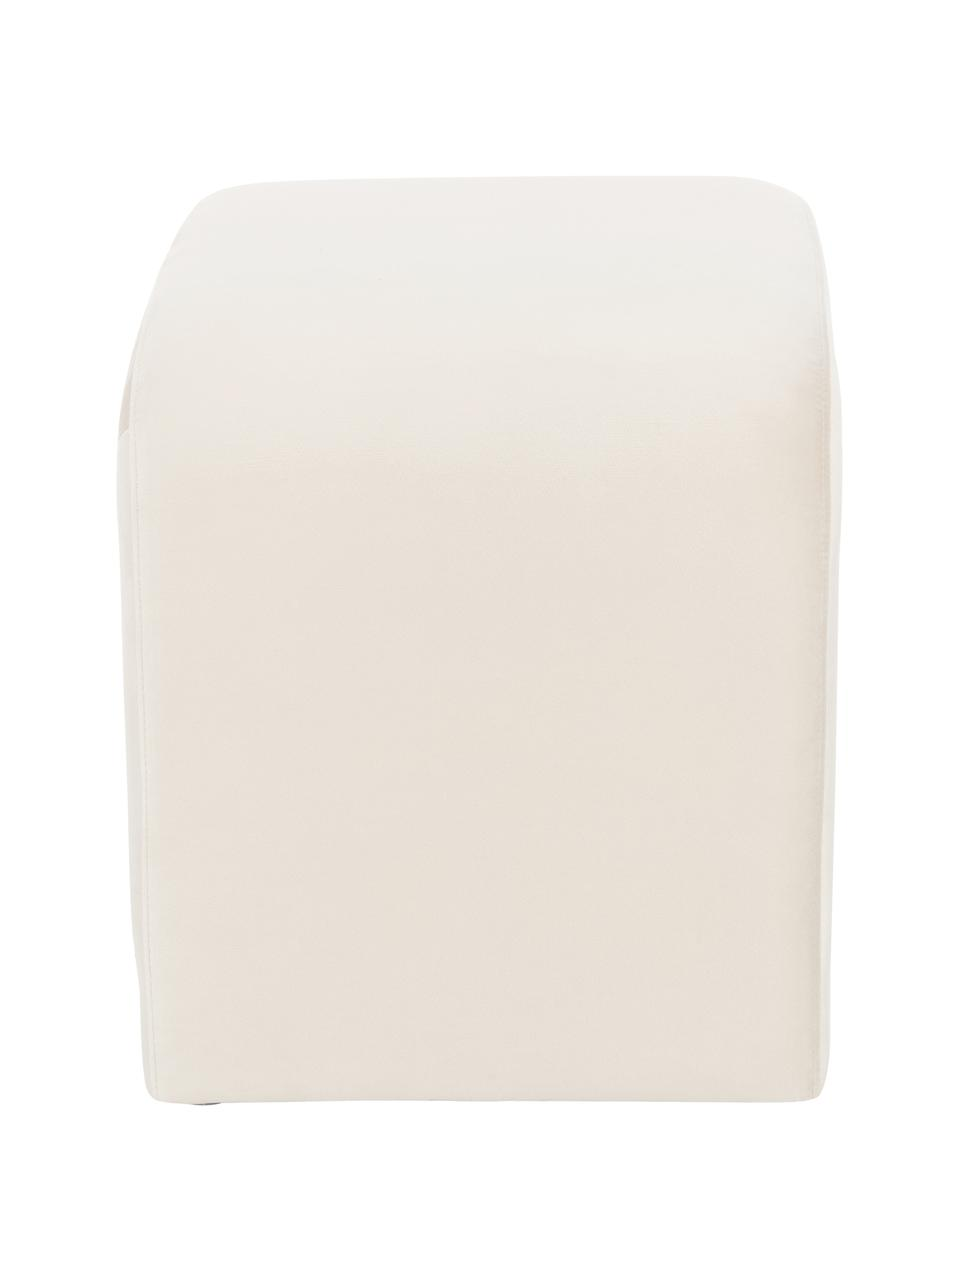 Fluwelen kruk Penelope, Bekleding: fluweel (polyester), Frame: metaal, spaanplaat, Crèmewit, 61 x 46 cm